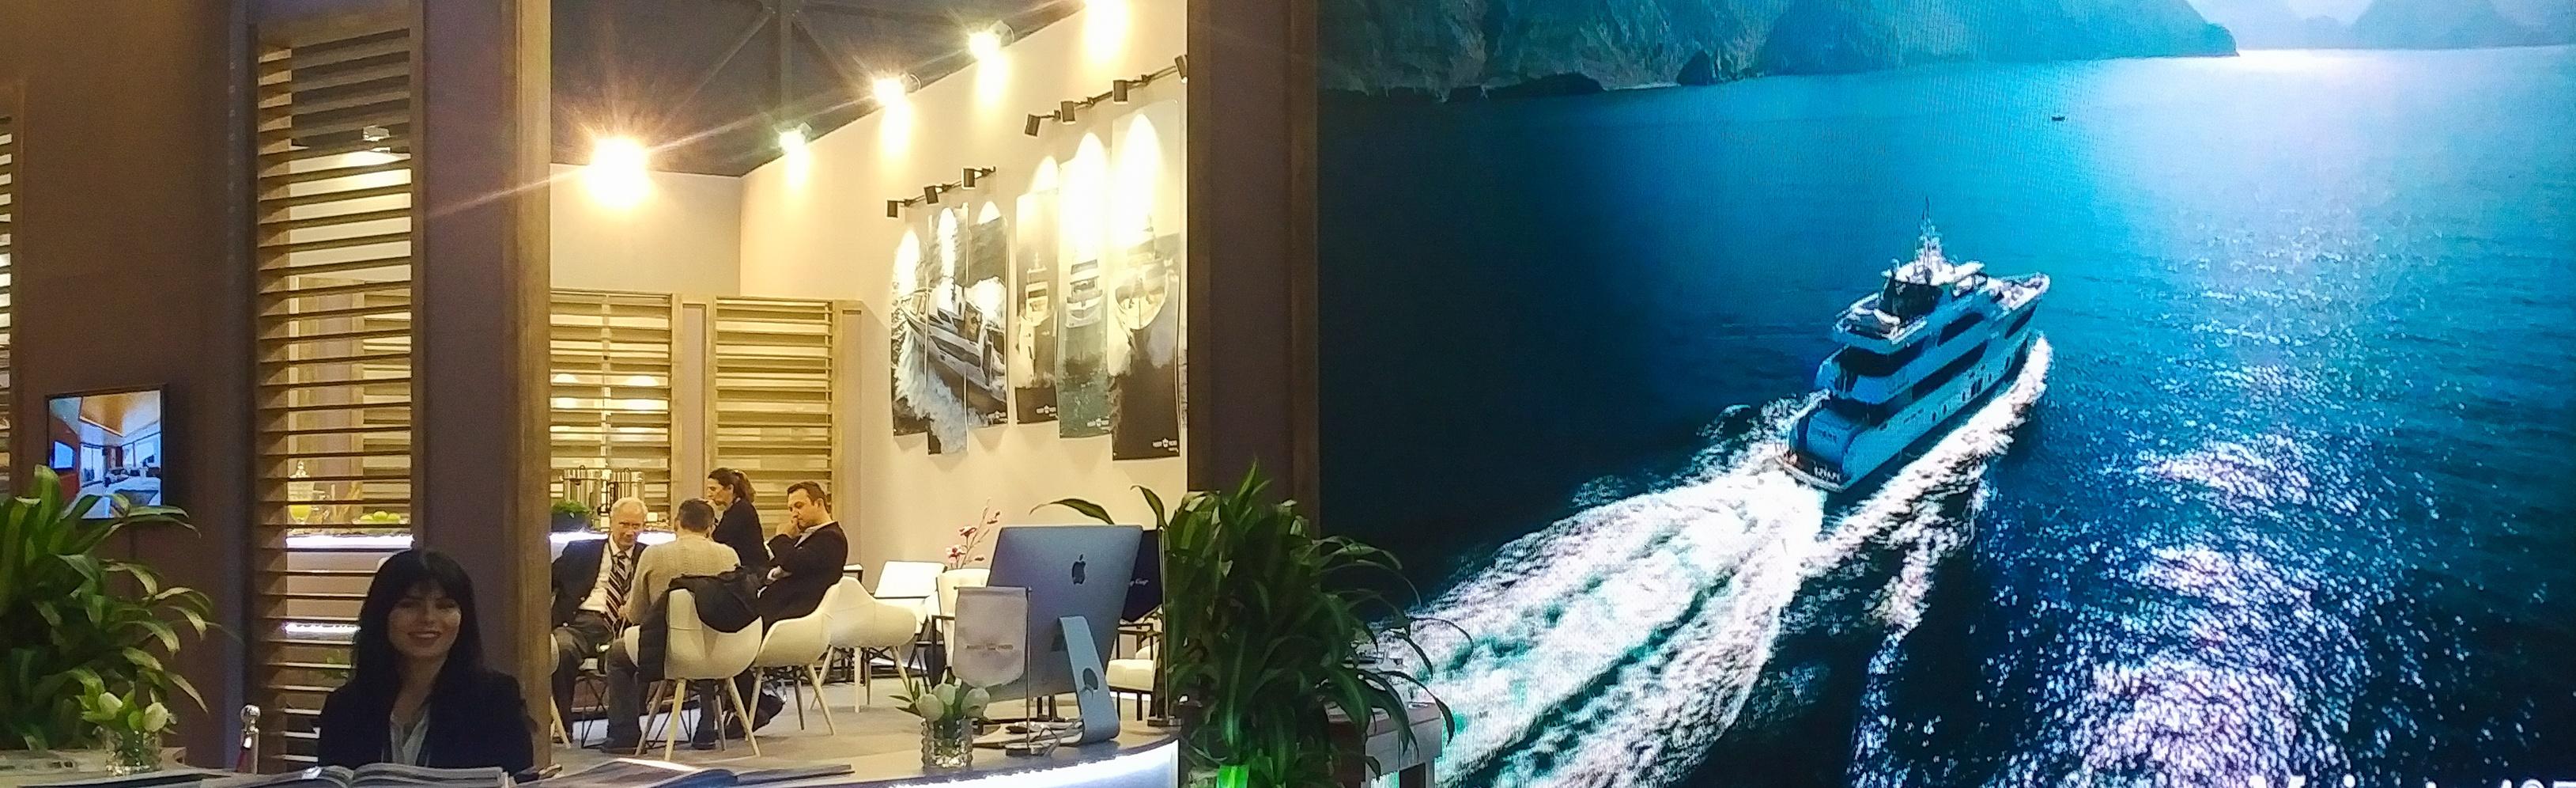 Gulf-Craft,-Tuzla-Boat-Show